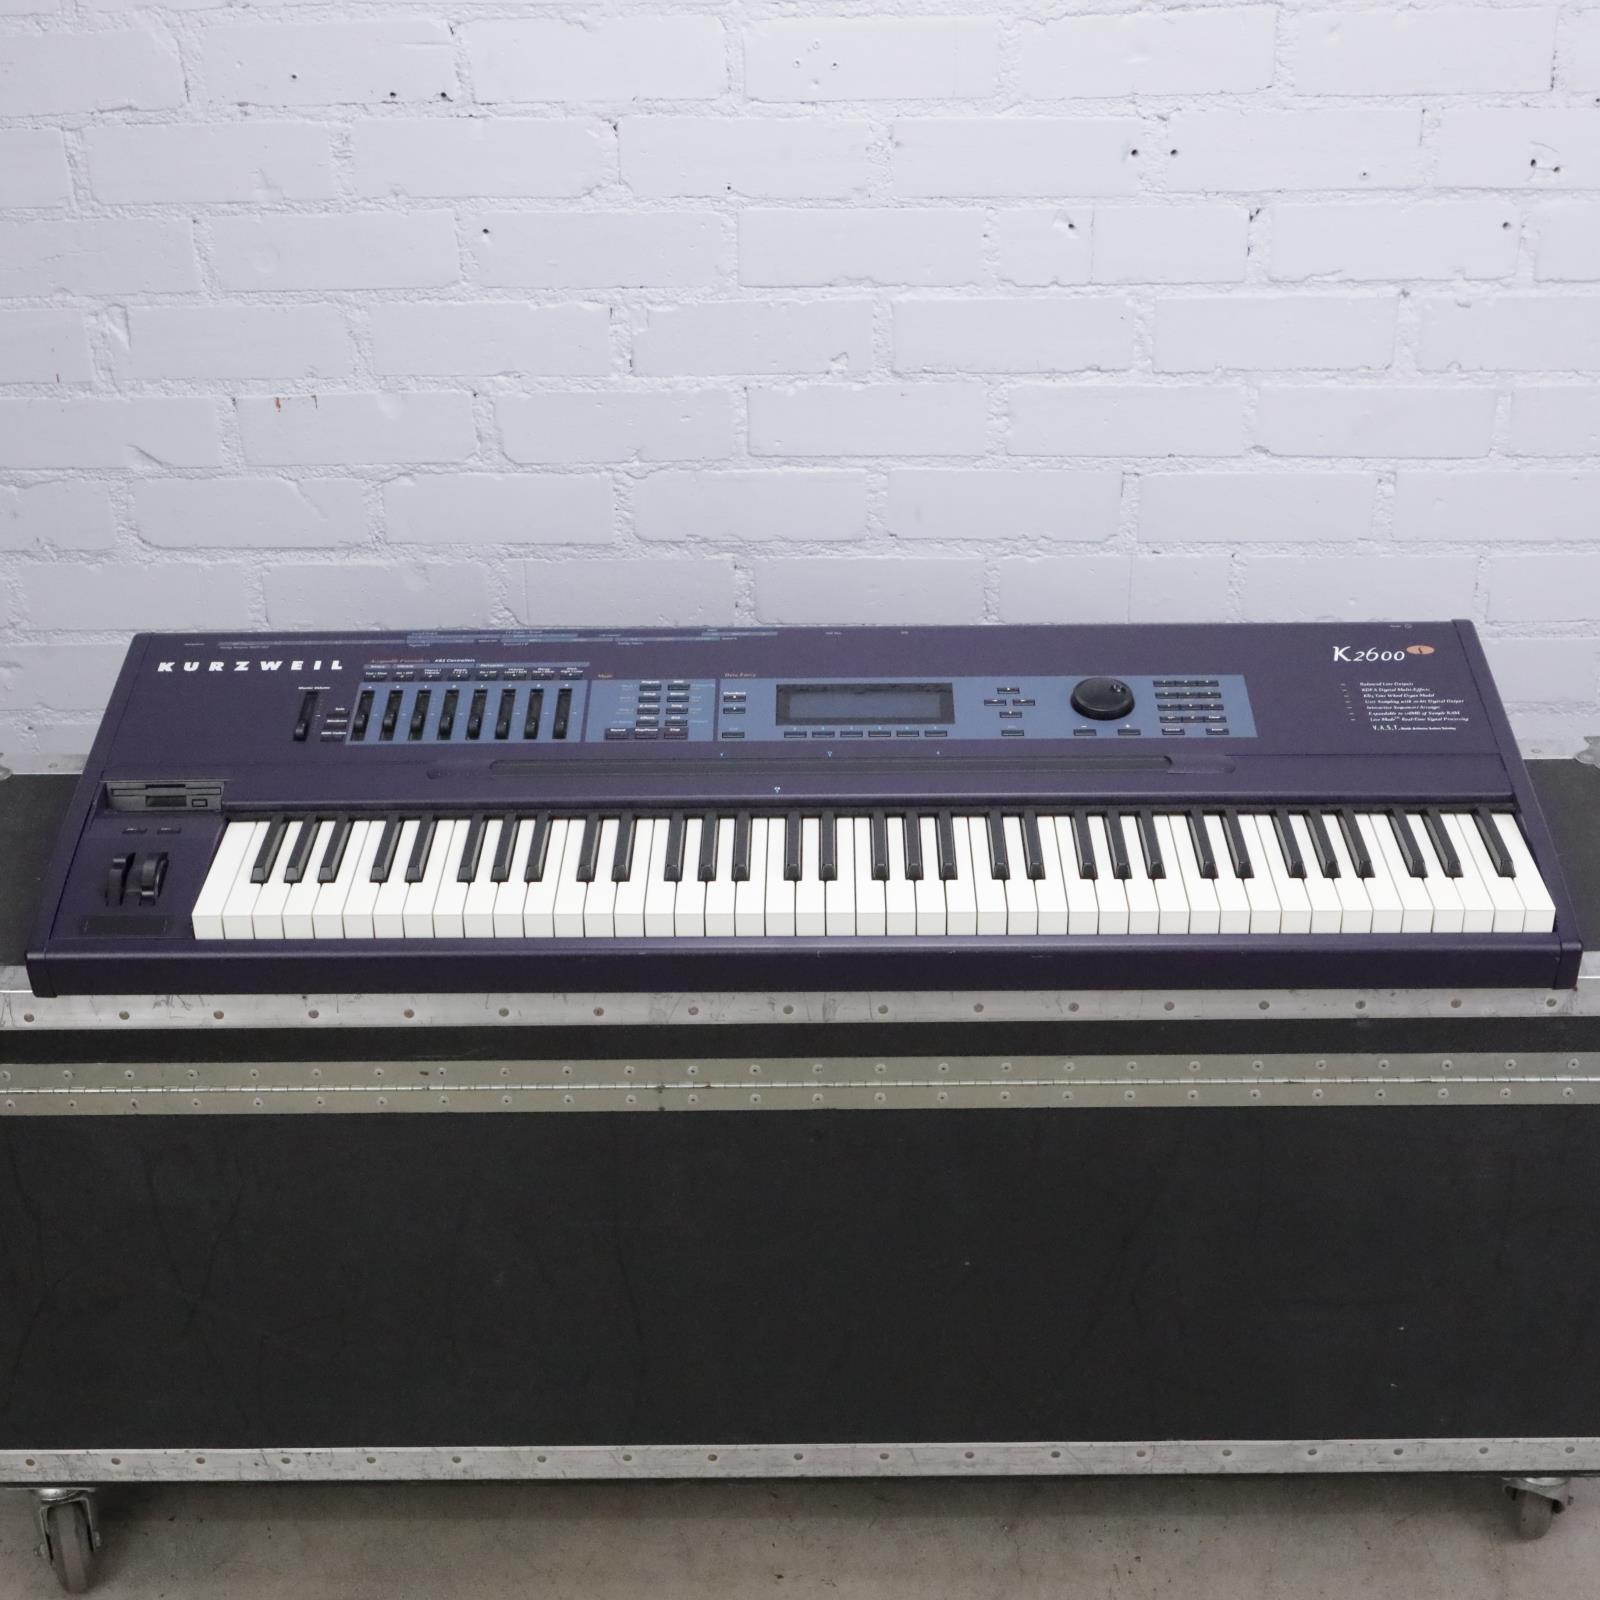 Kurzweil K2600S 76-Key Synthesizer Sampler Keyboard Workstation K2600 #43536